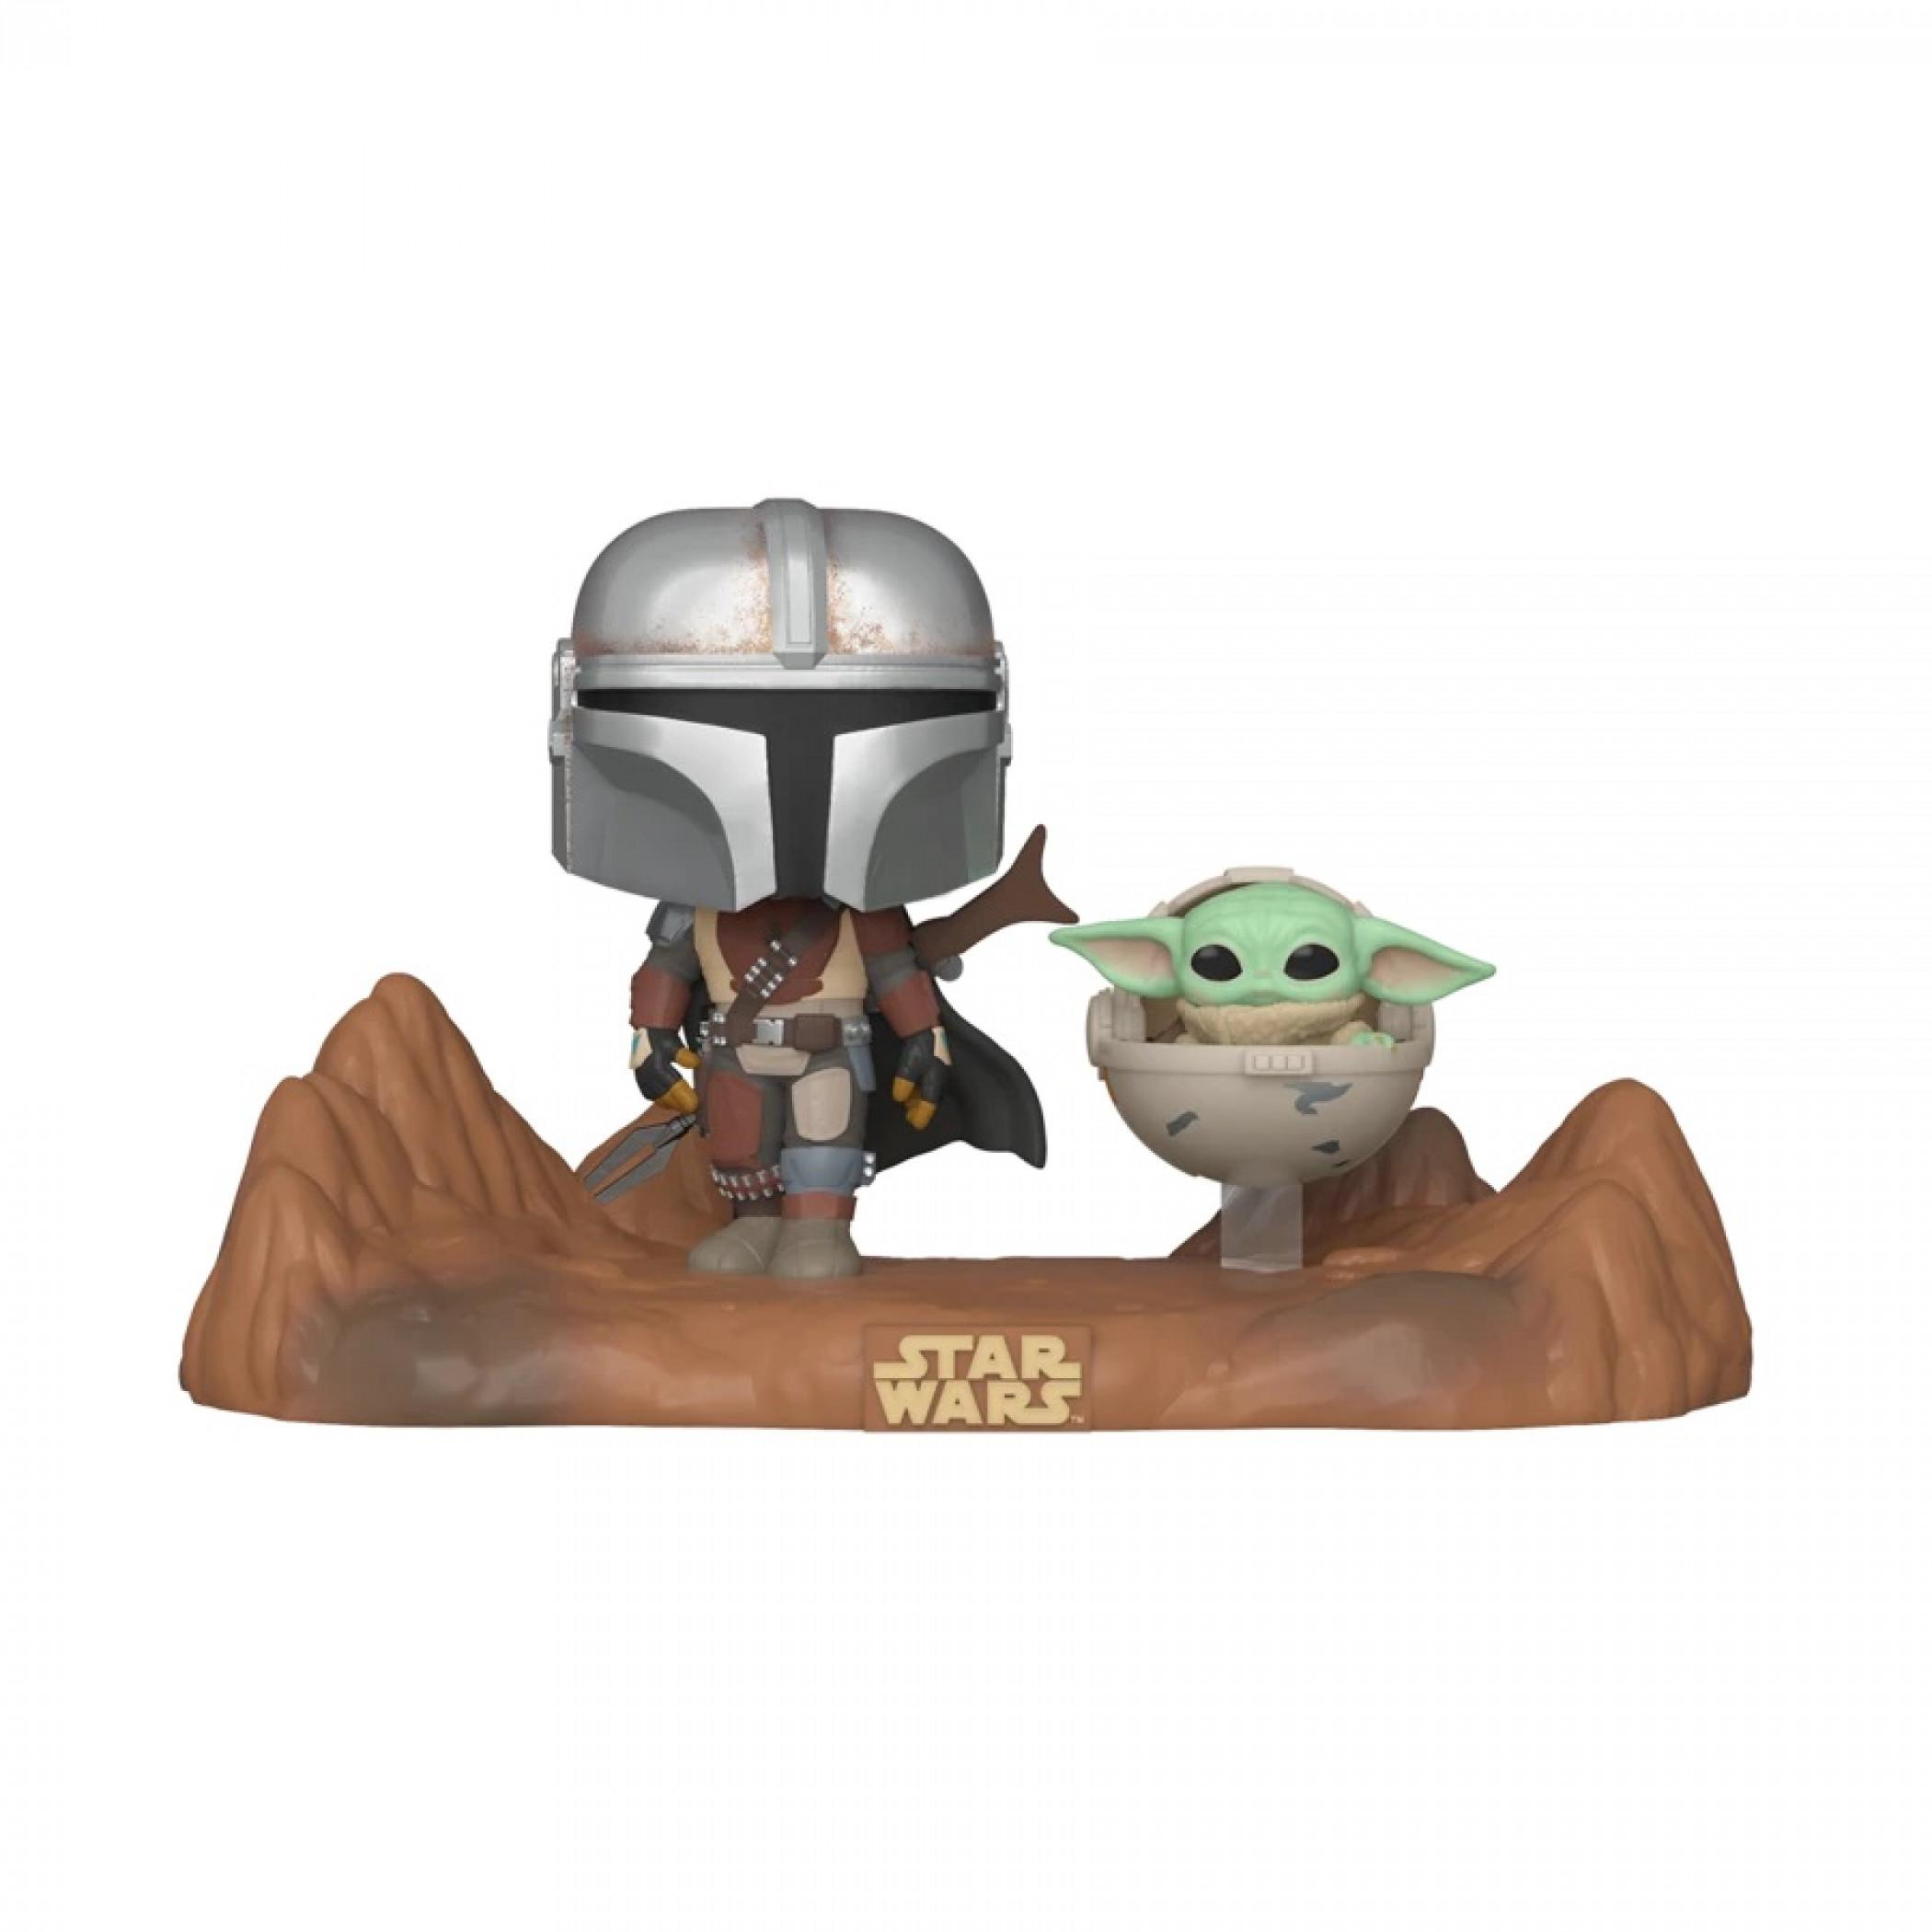 Star Wars The Mandalorian & The Child Funko Pop! Movie Moment Figure